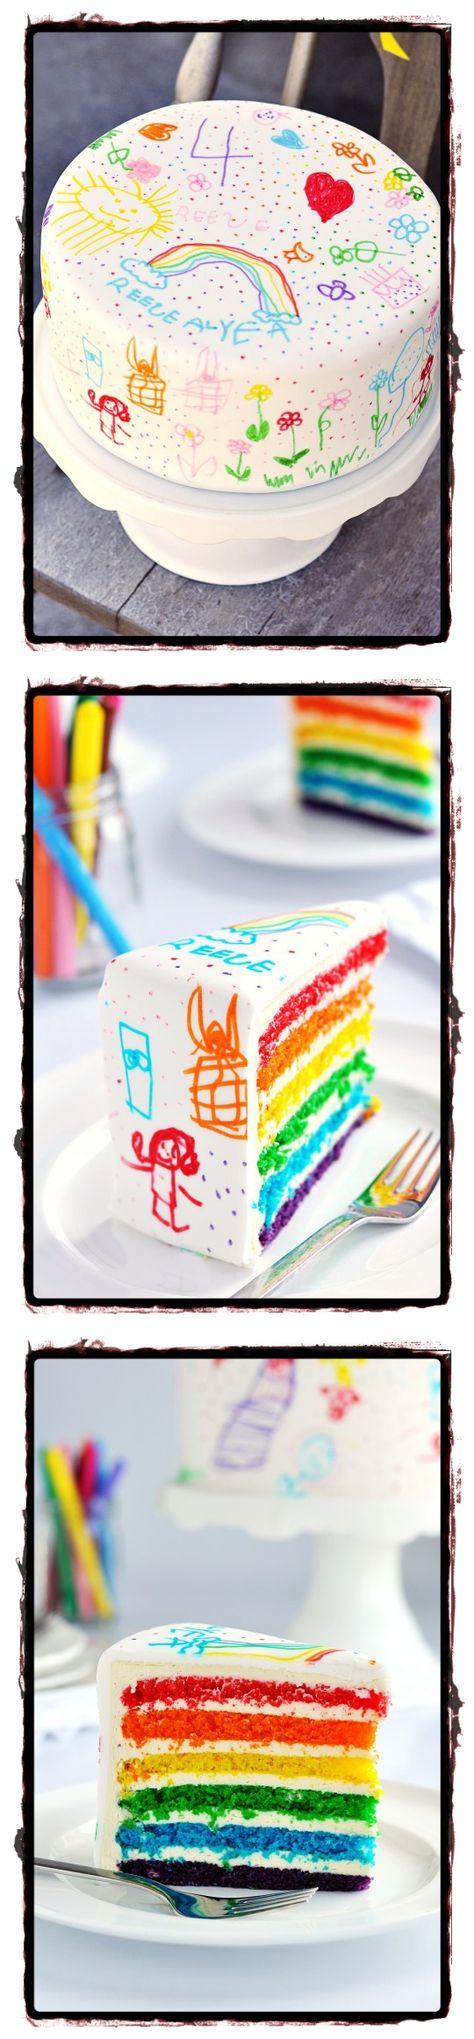 Rainbow Doodle Birthday Cake For Kids